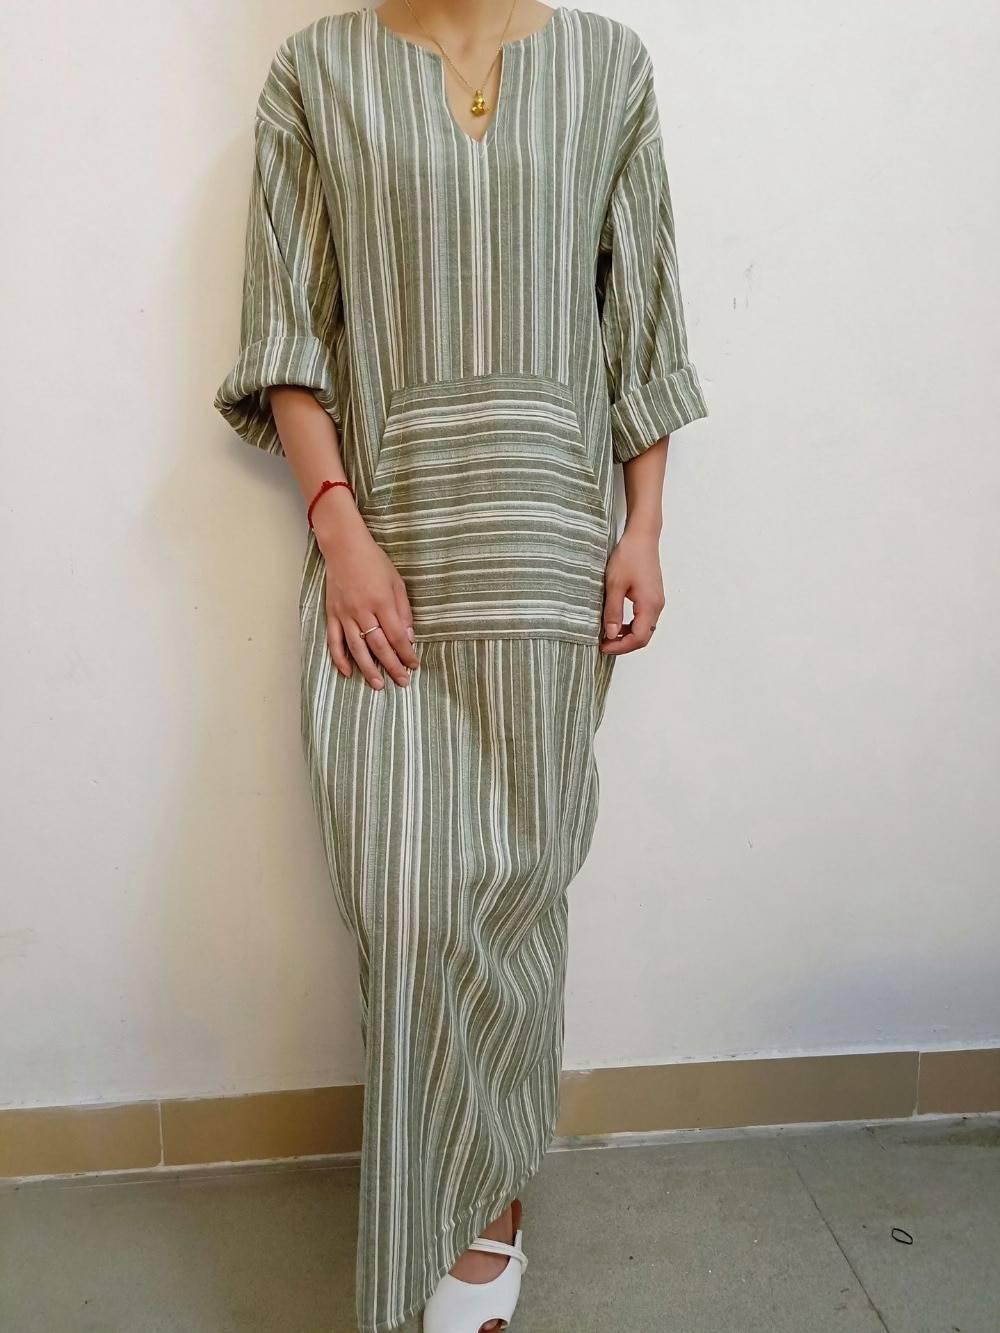 Womens Cotton Linen Dress Big size 5XL large size Kaftan Long Sleeve 2020 Summer Striped Women Plus Size Long Maxi Boho Dresses